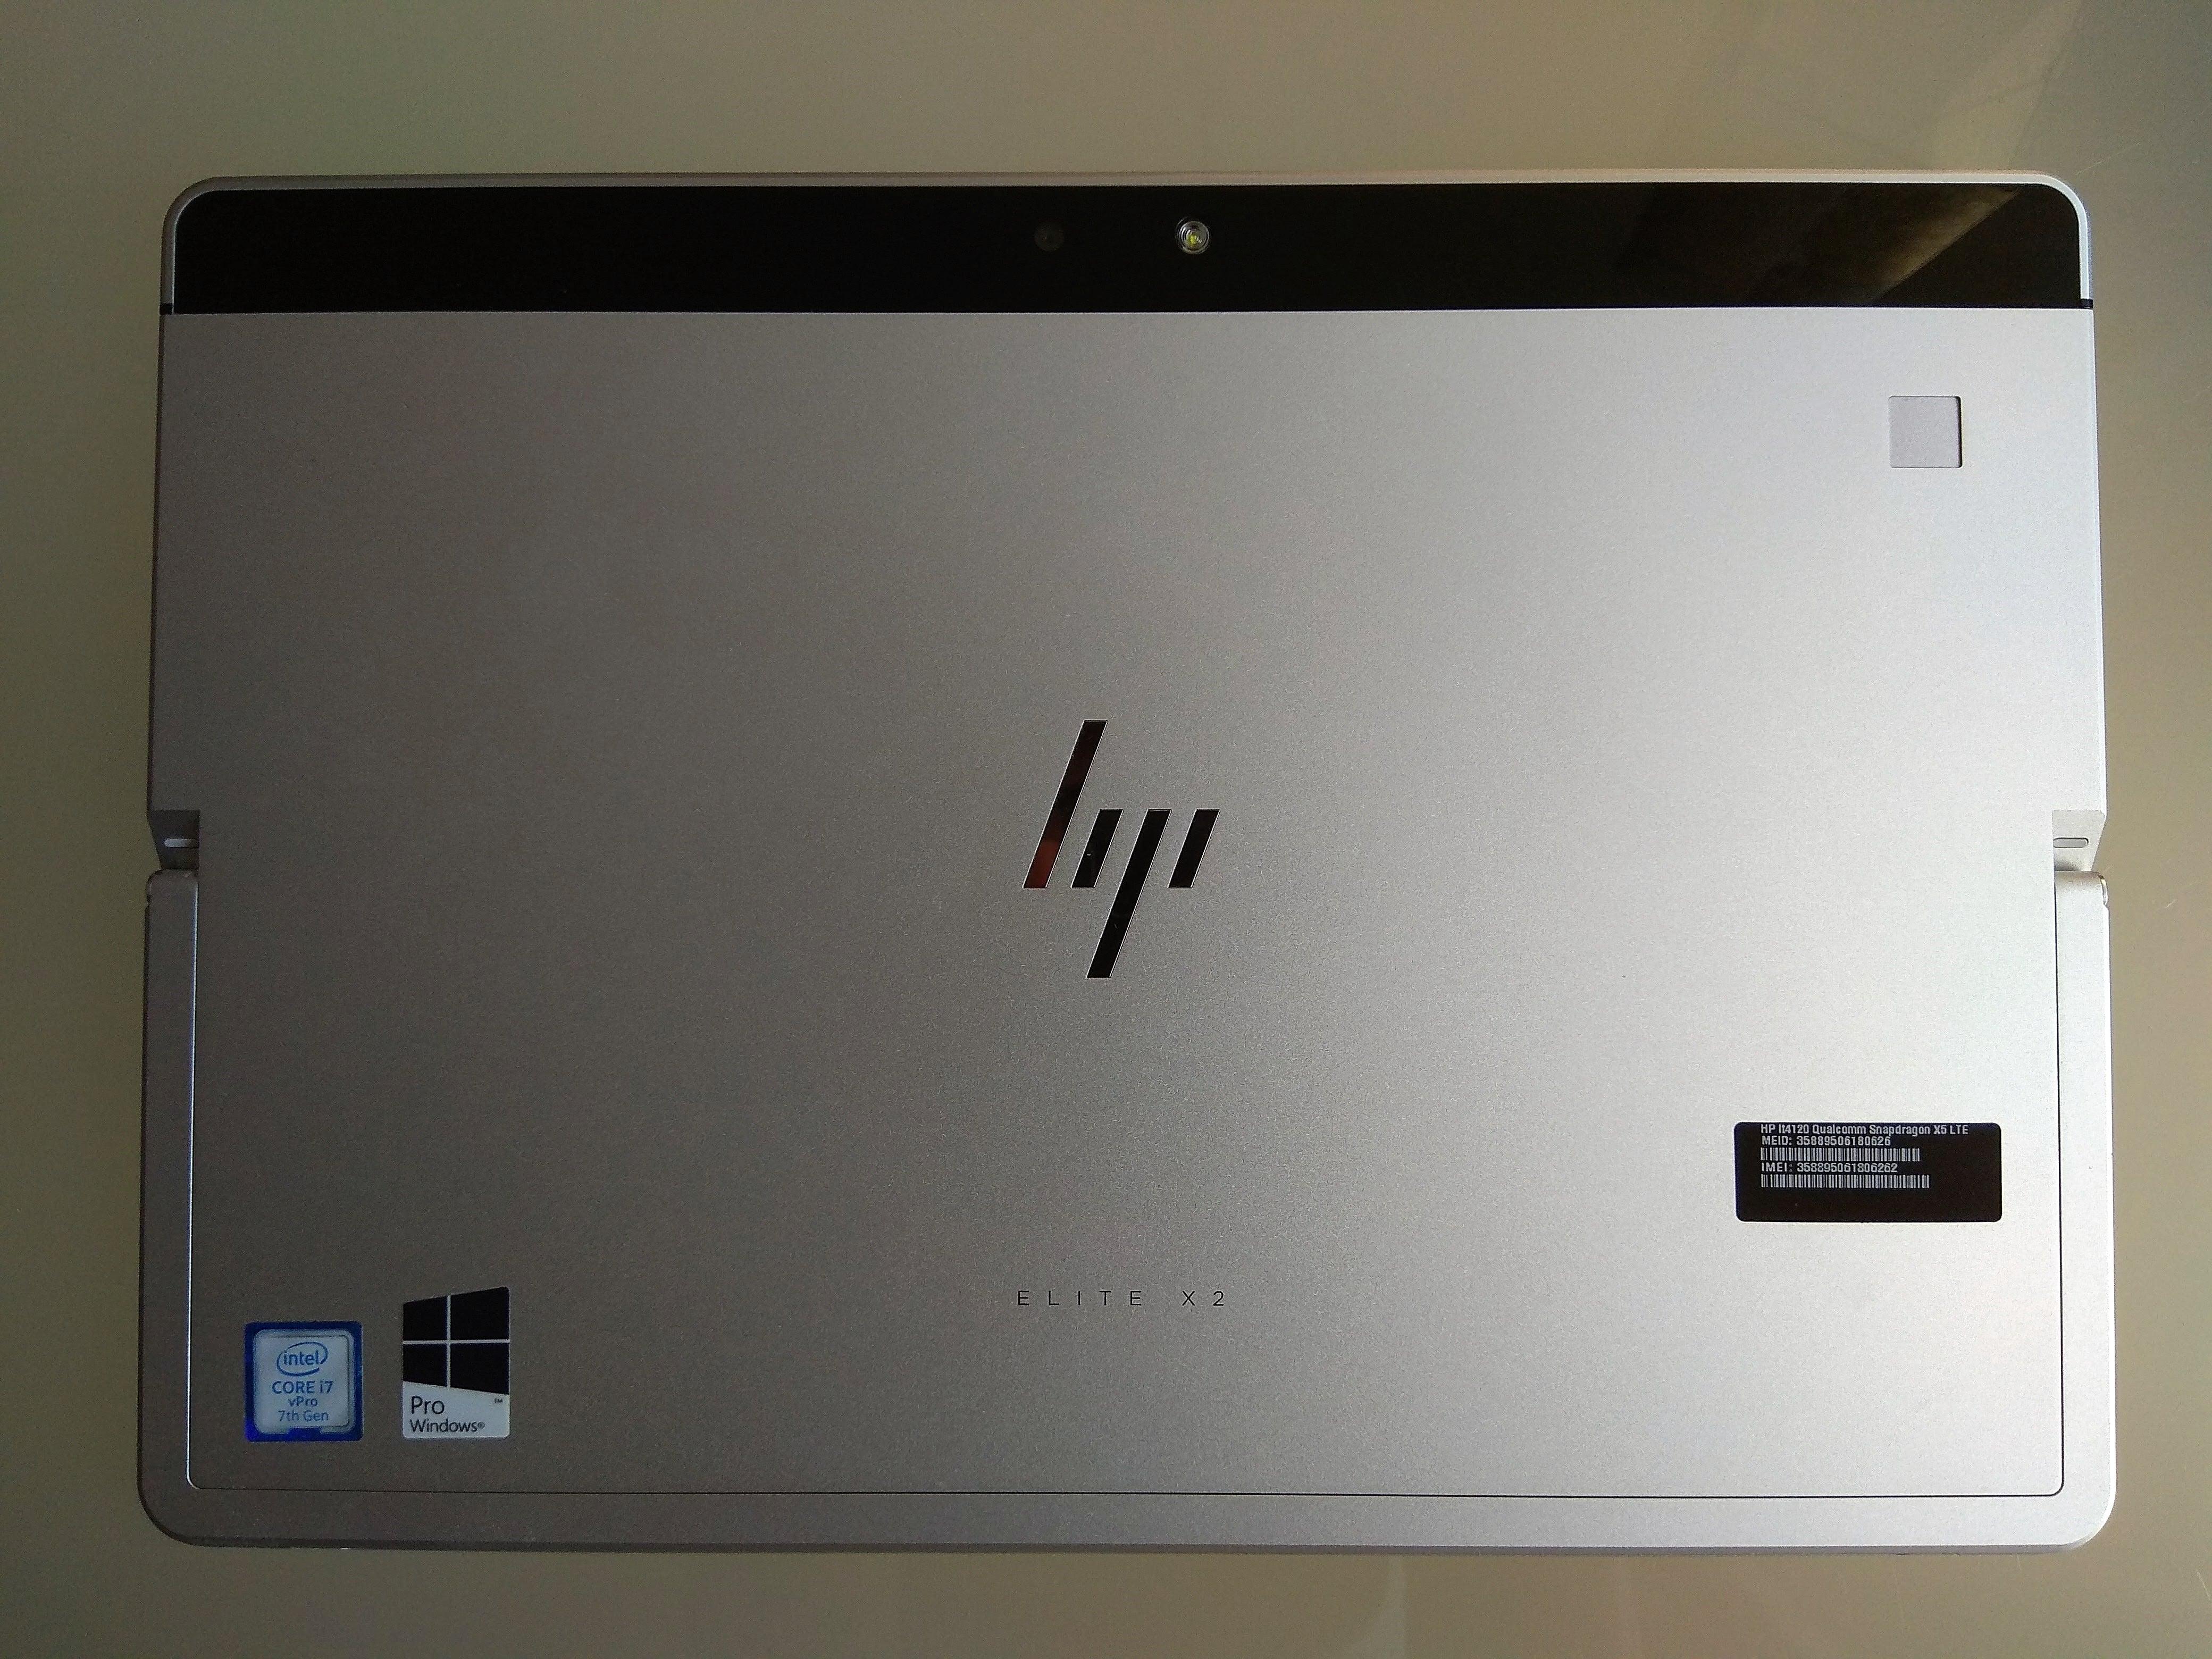 Recenzja HP Elite X2 - jak profesjonalna kobieta sukcesu 22